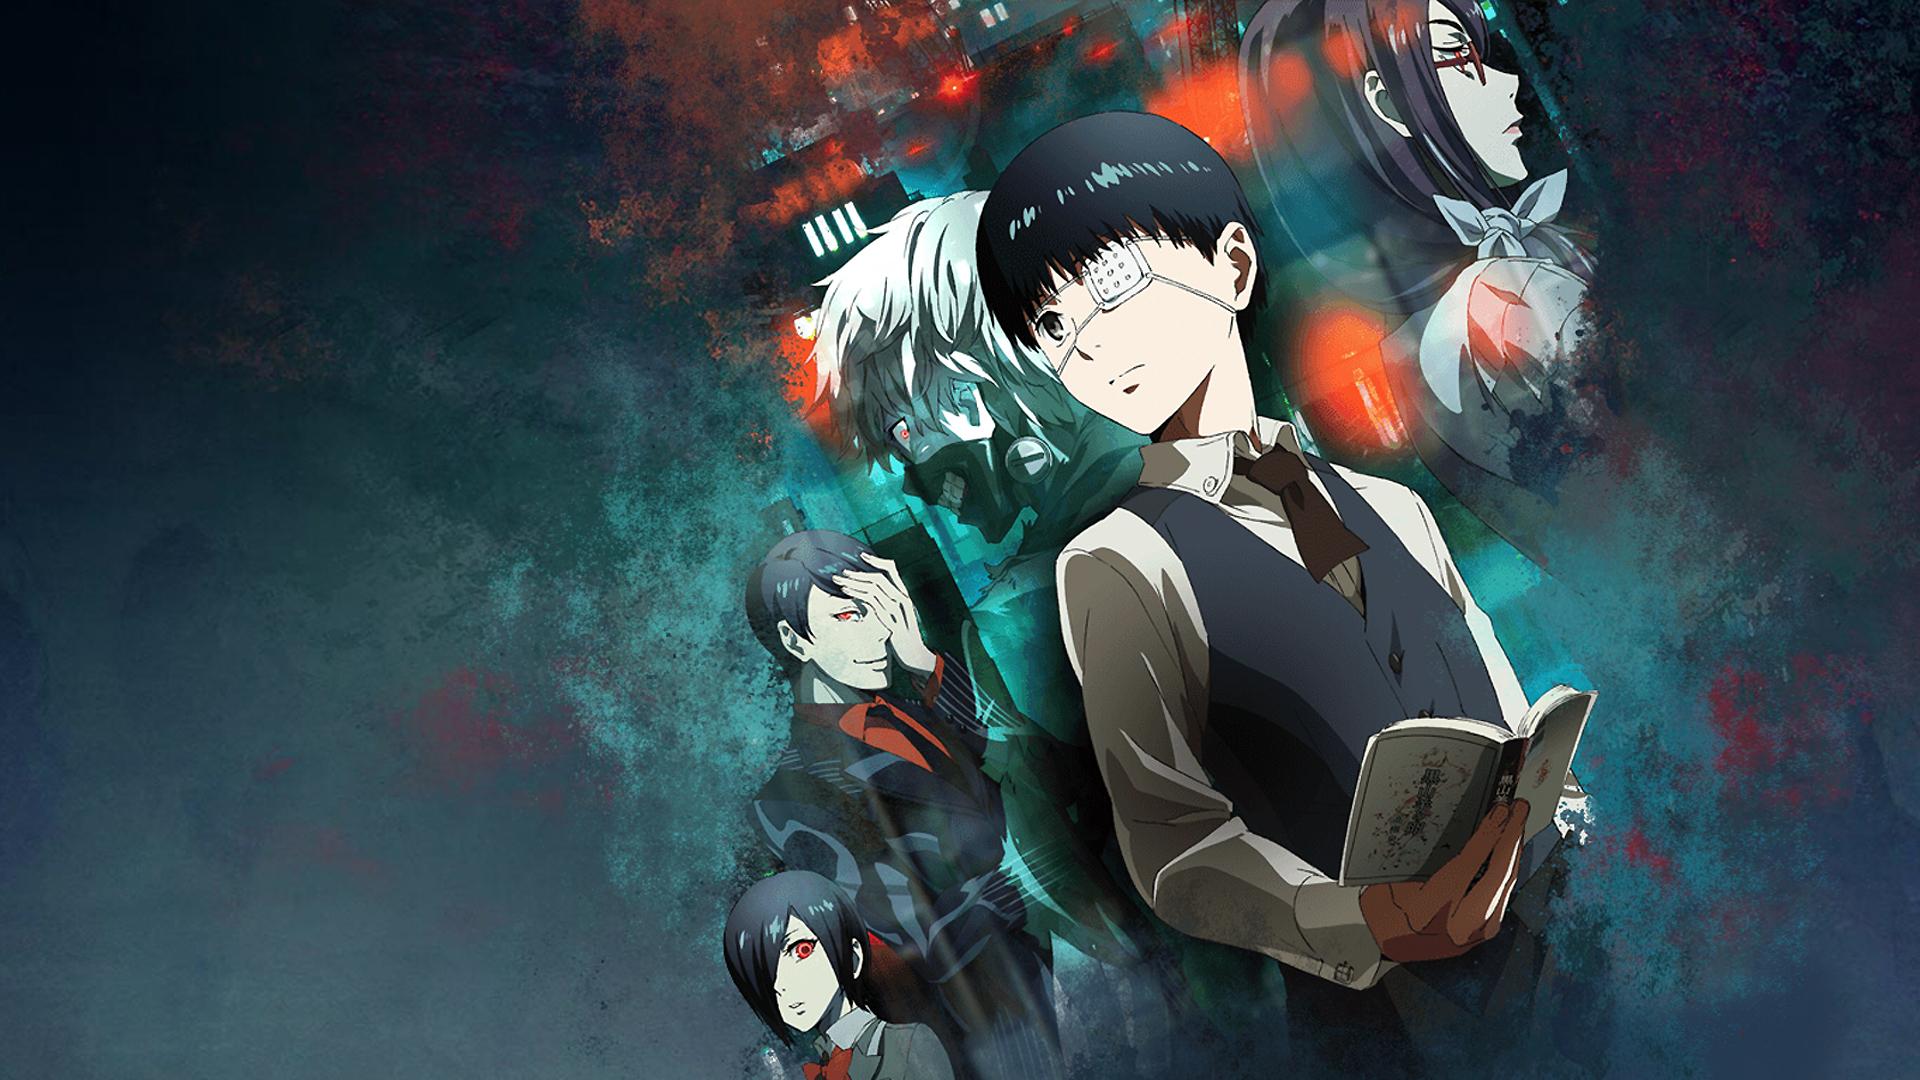 Tokyo Ghoul Anime HD Wallpaper 1920x1080